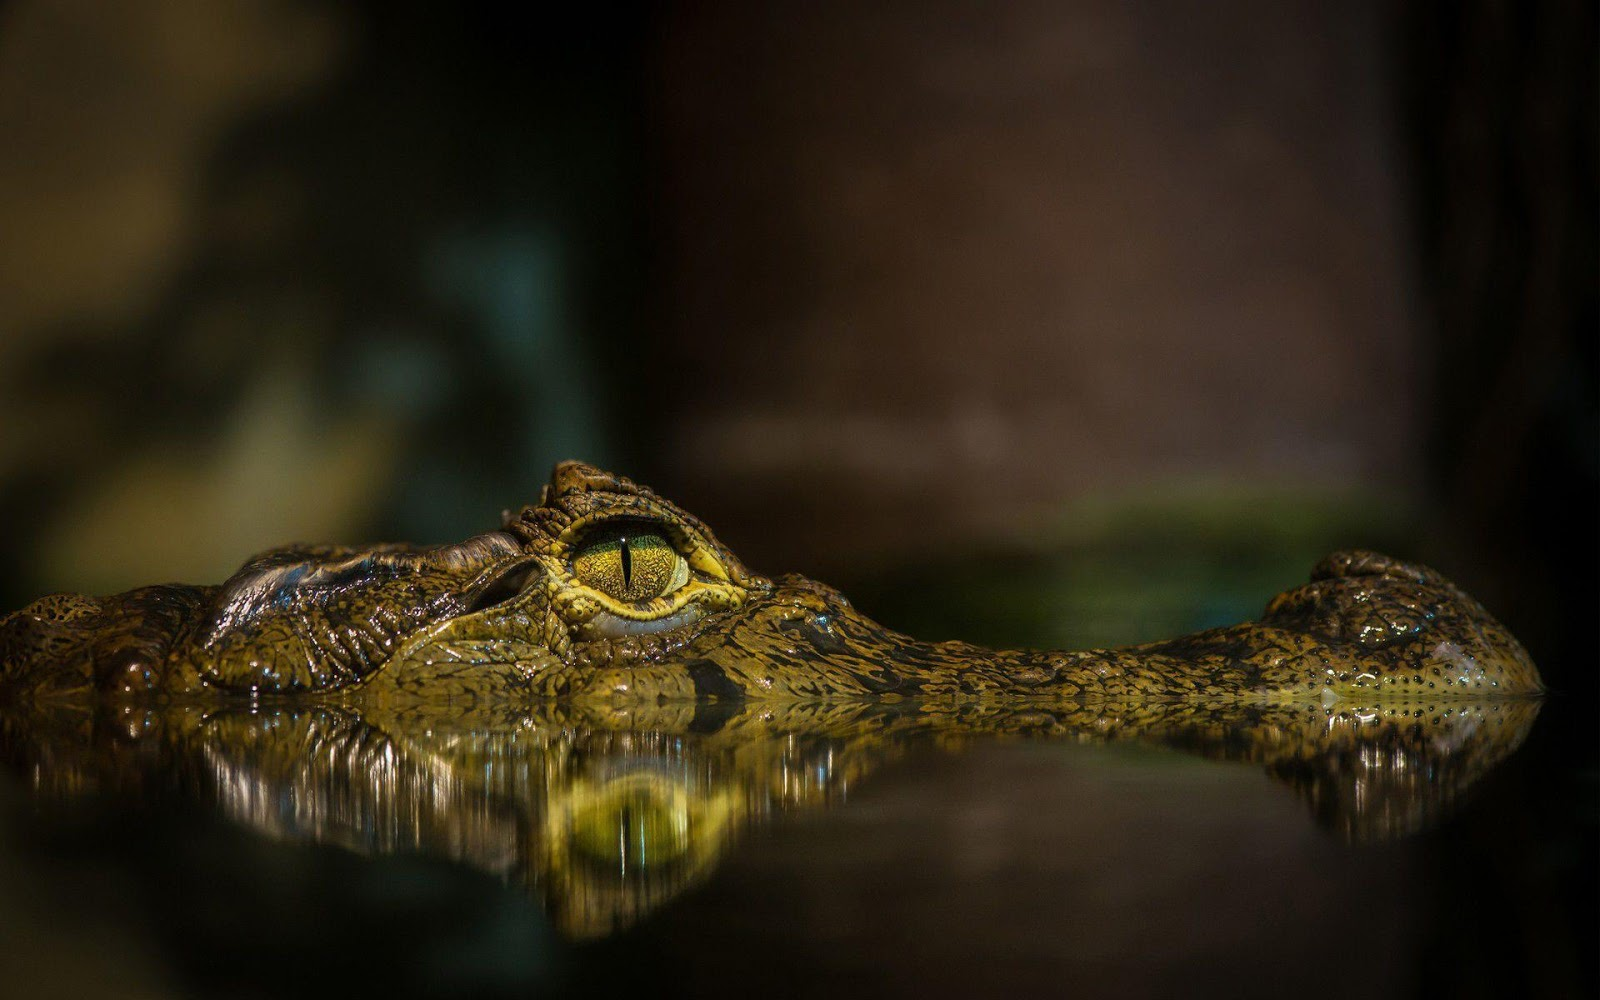 Alligator HD Wallpapers, animal wallpapers